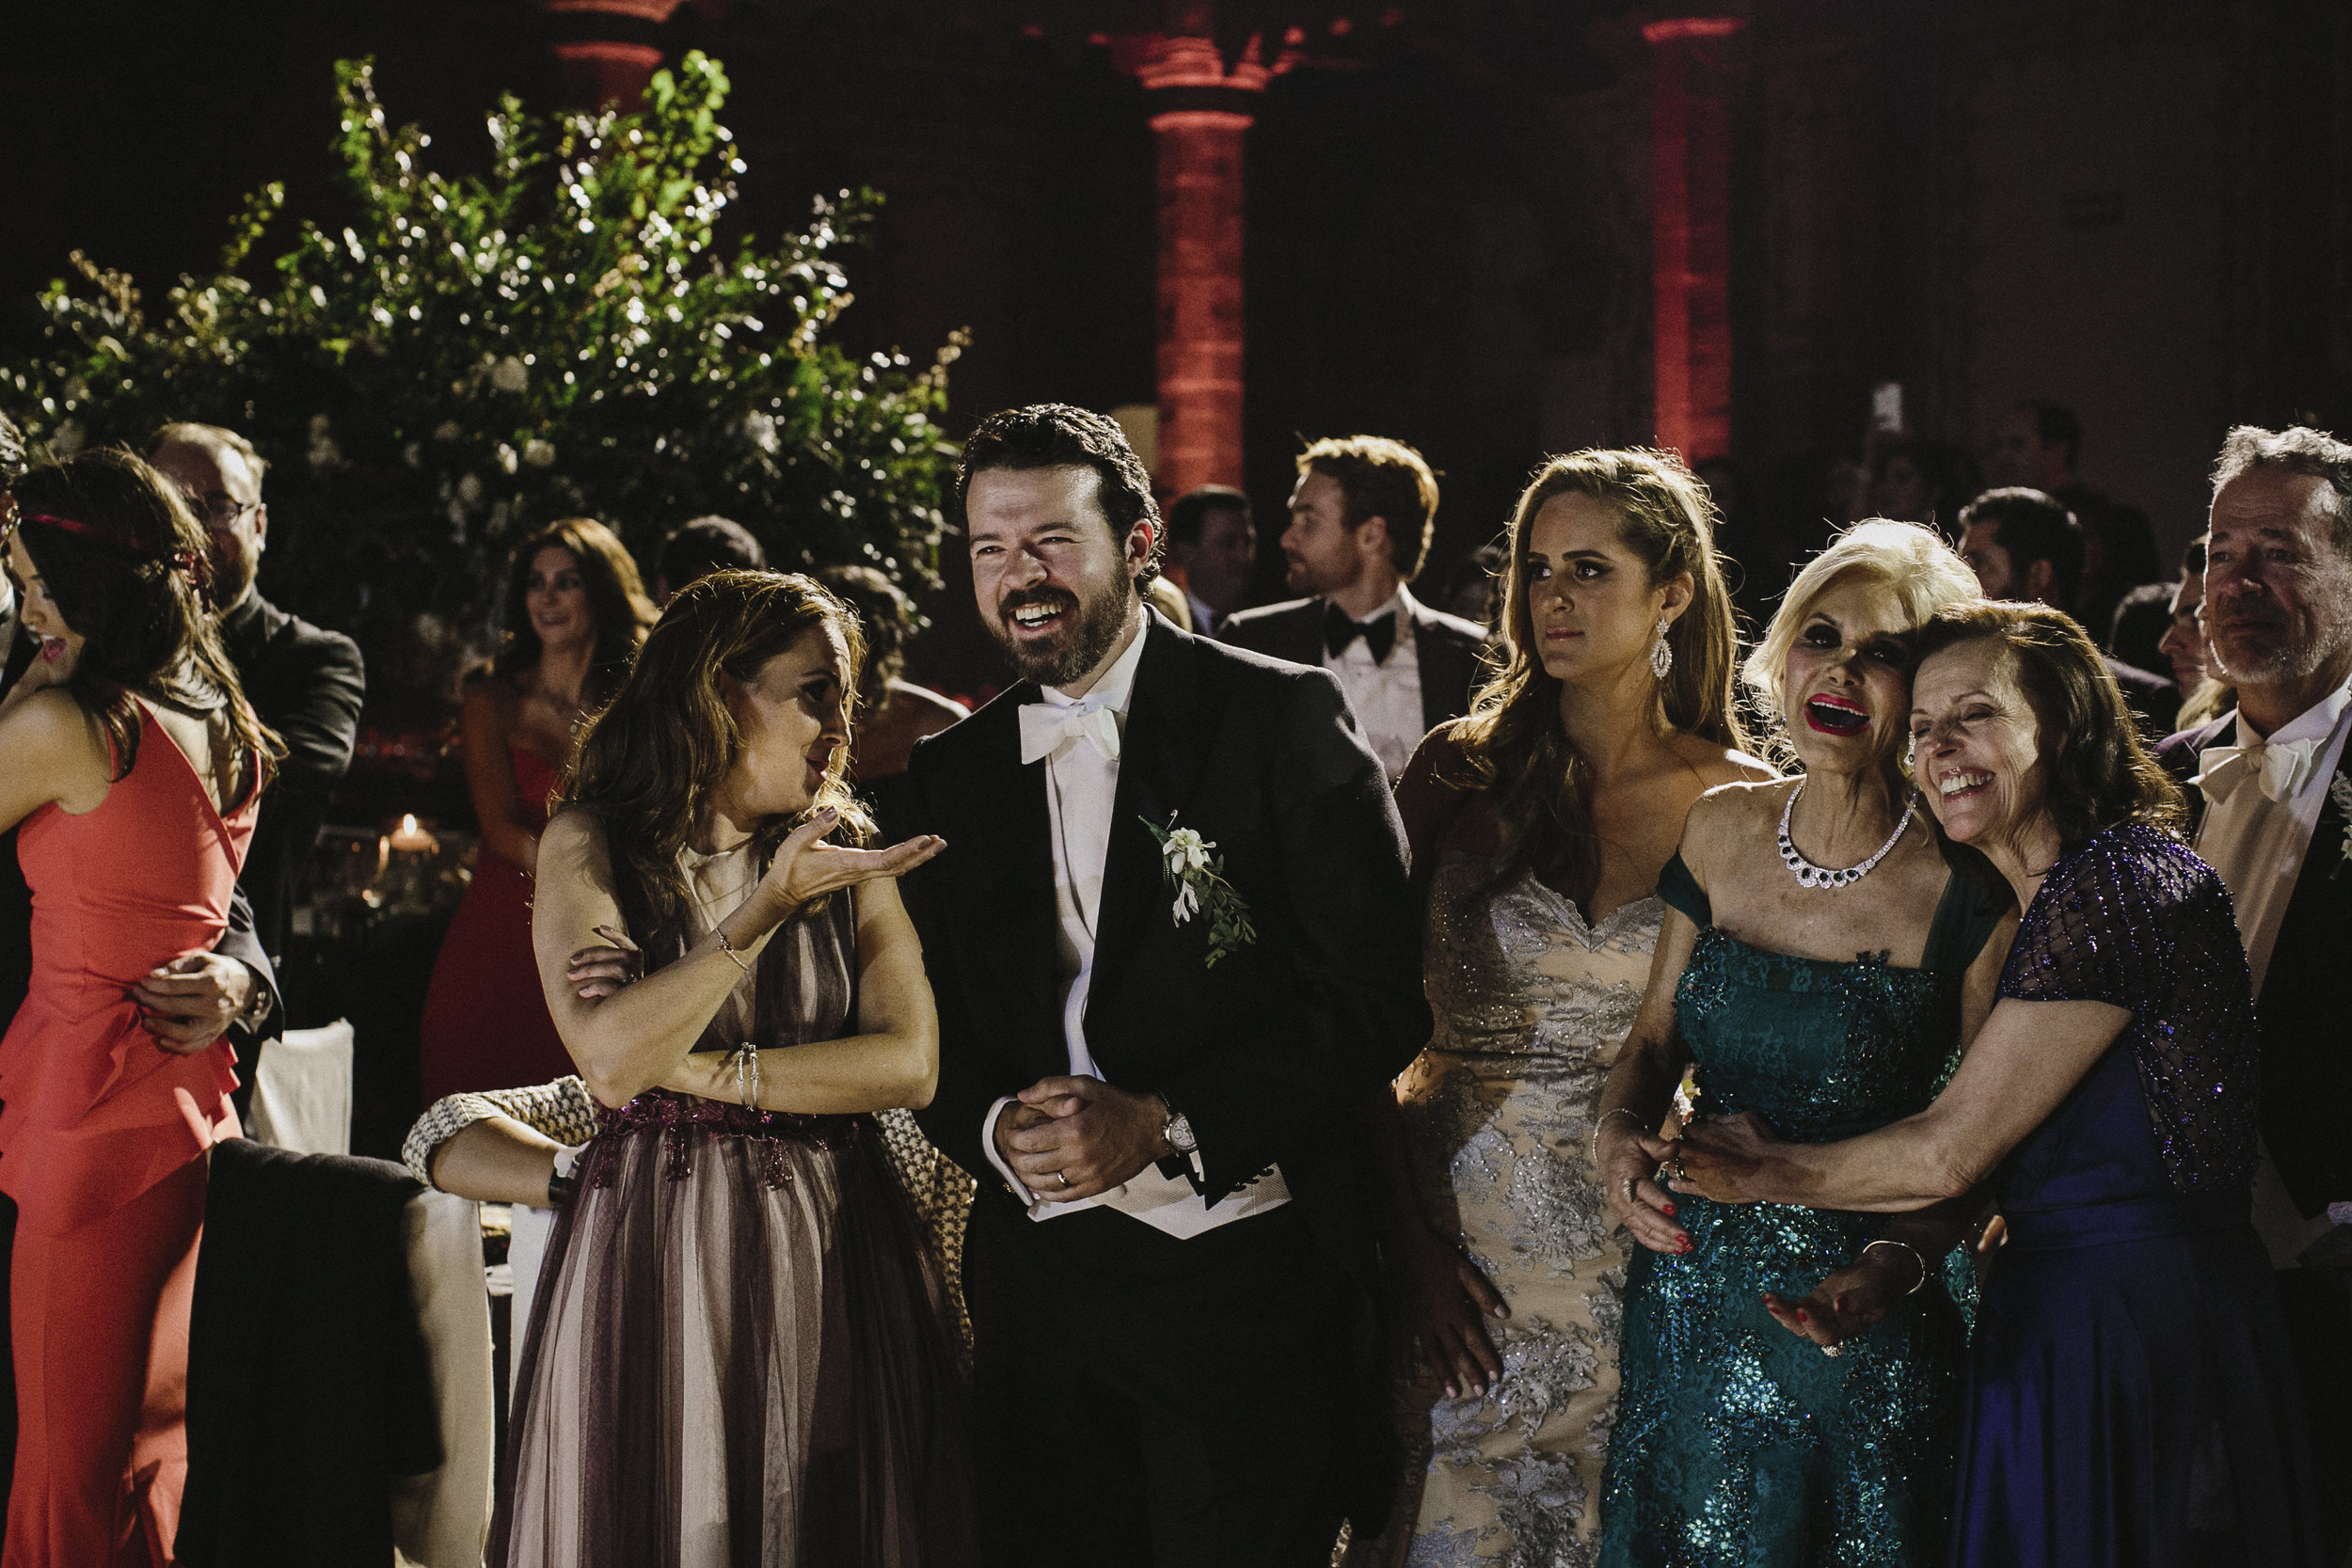 alfonso_flores_destination_wedding_photogrpahy_paola_alonso-1017.JPG